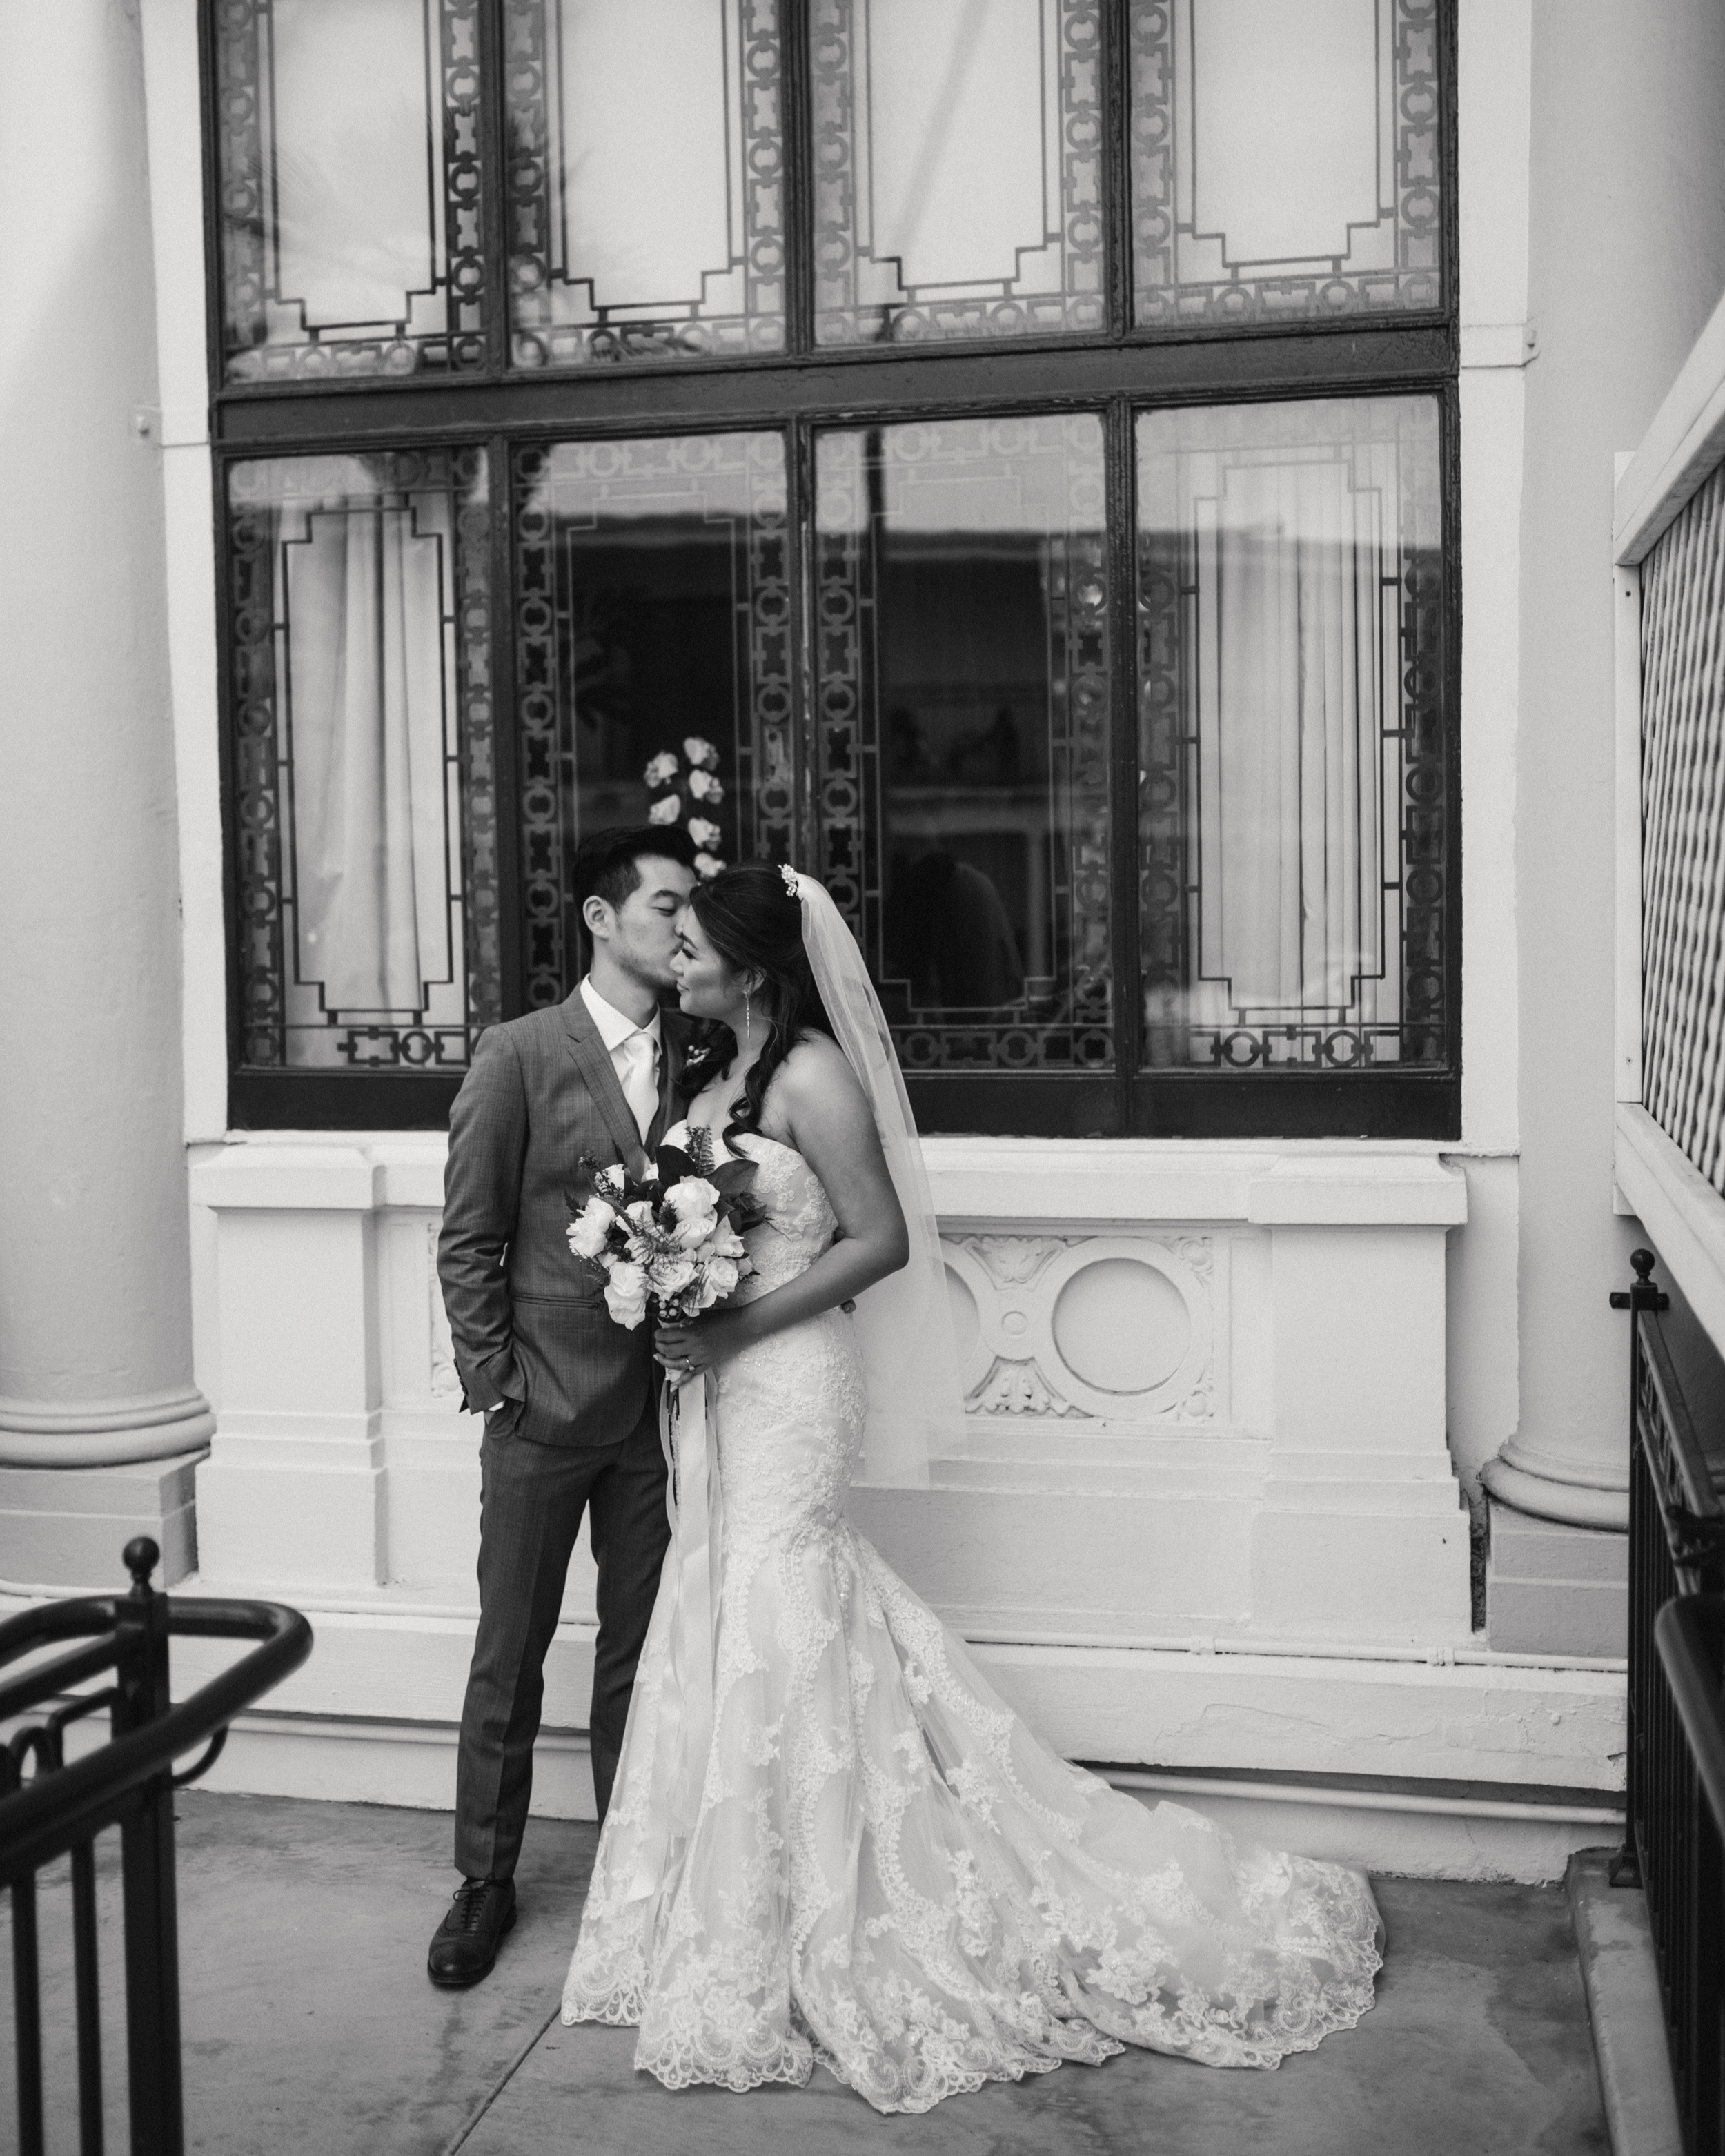 wedding_coronado_community_center-16.jpg